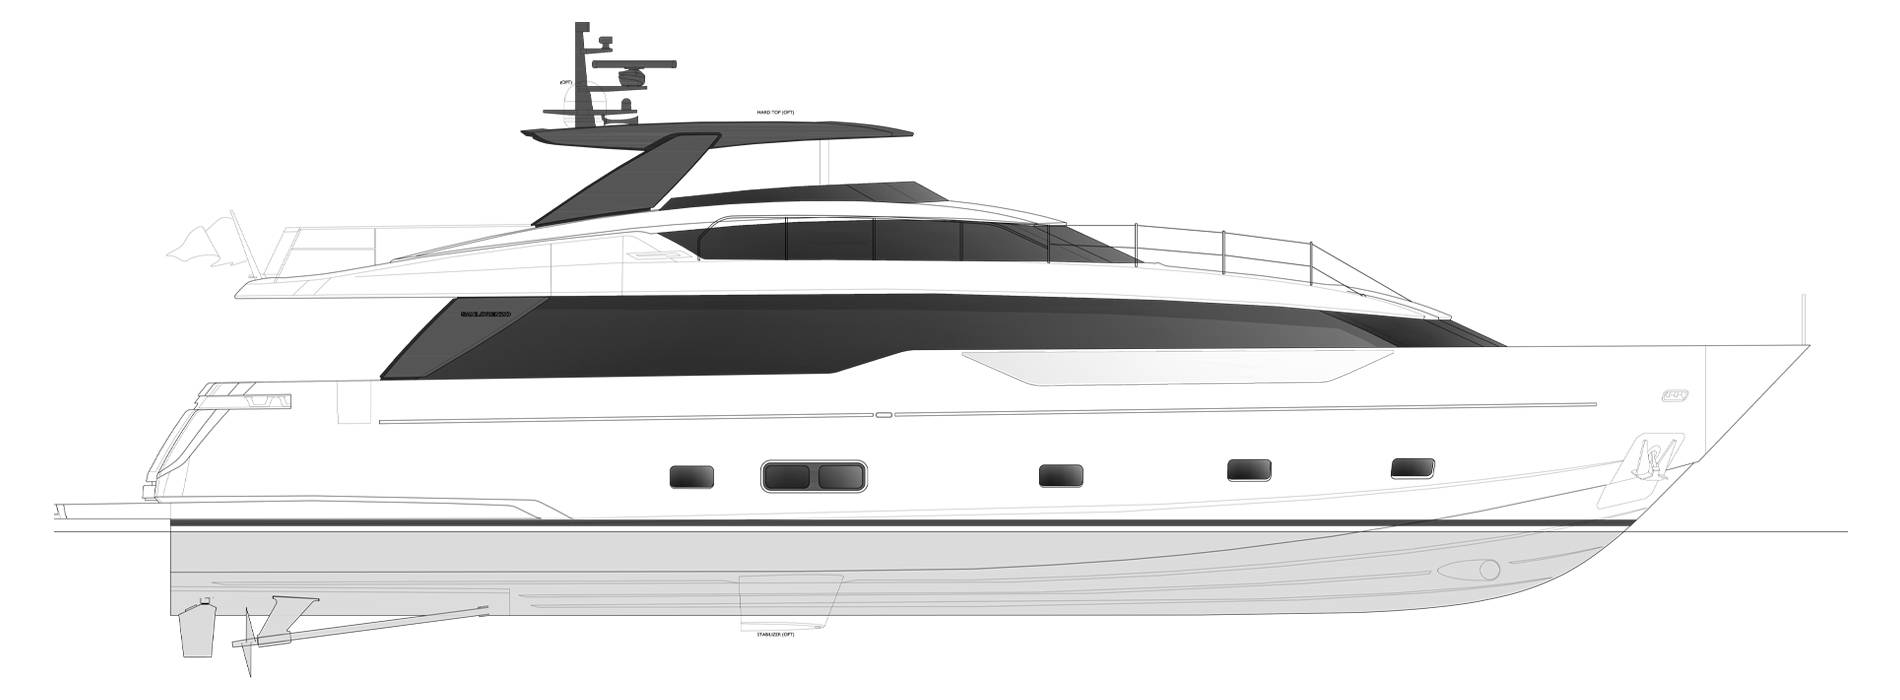 Sanlorenzo Yachts SL90 Asymmetric 外观